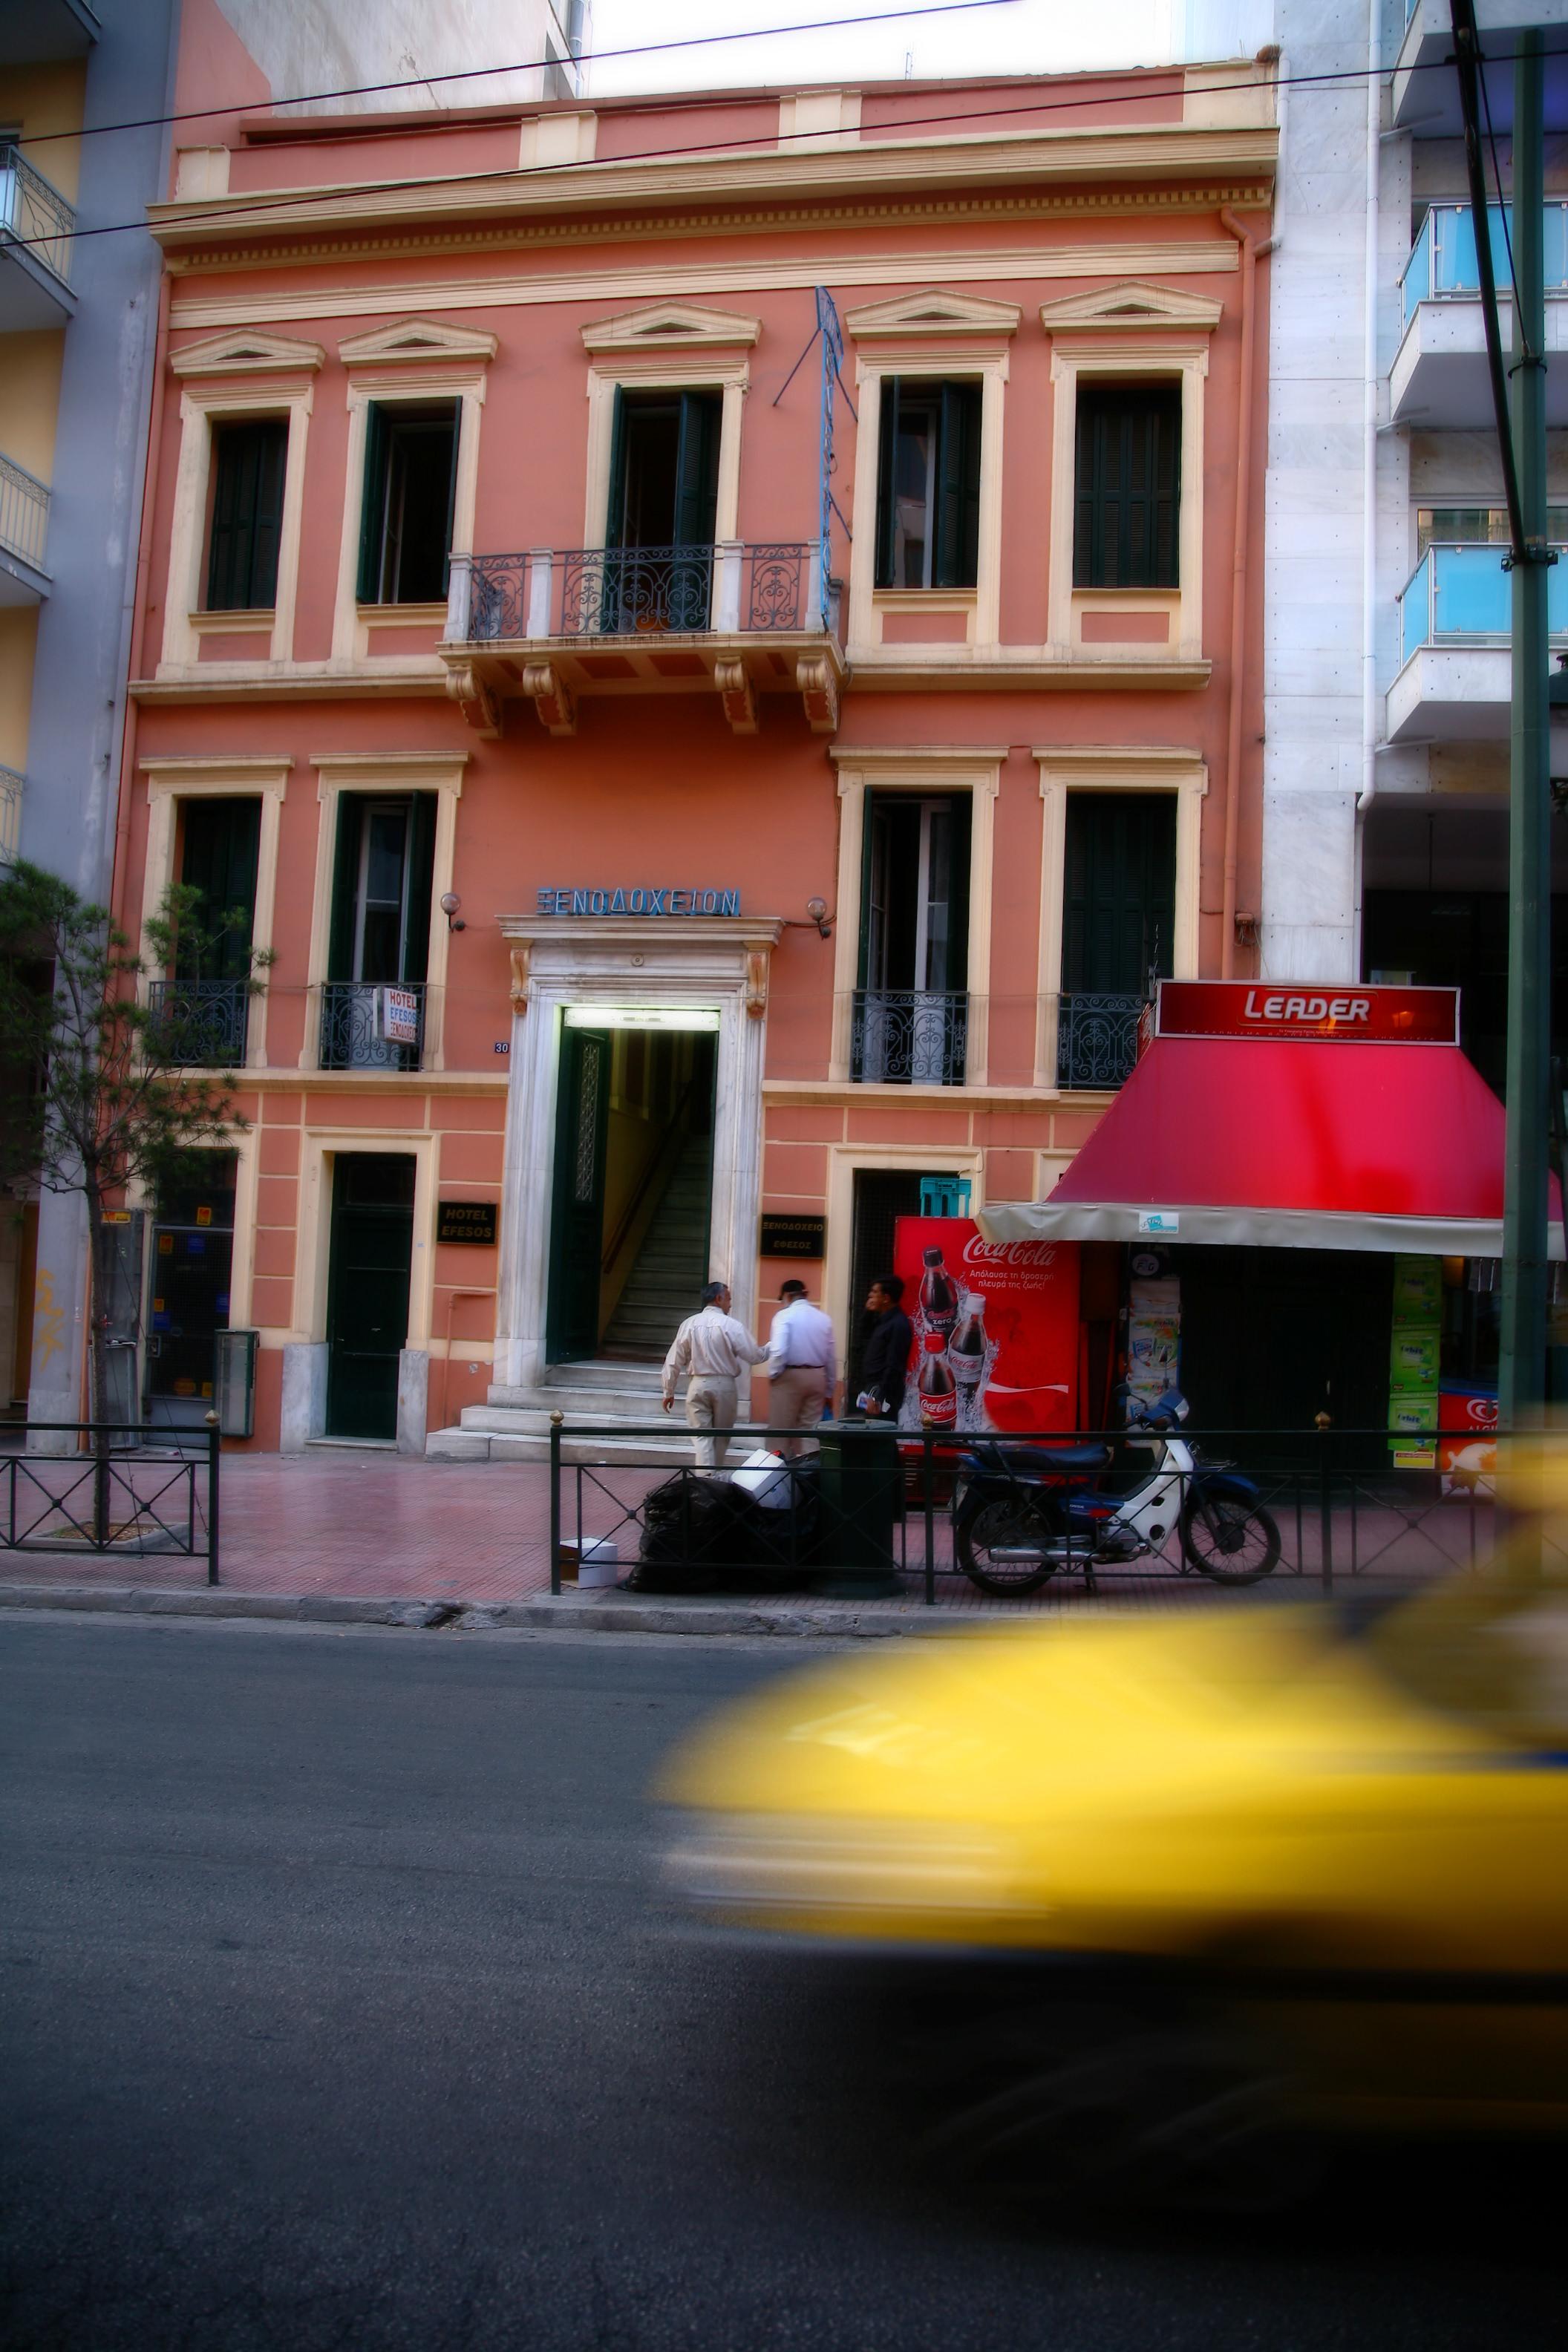 Greece, movement, car